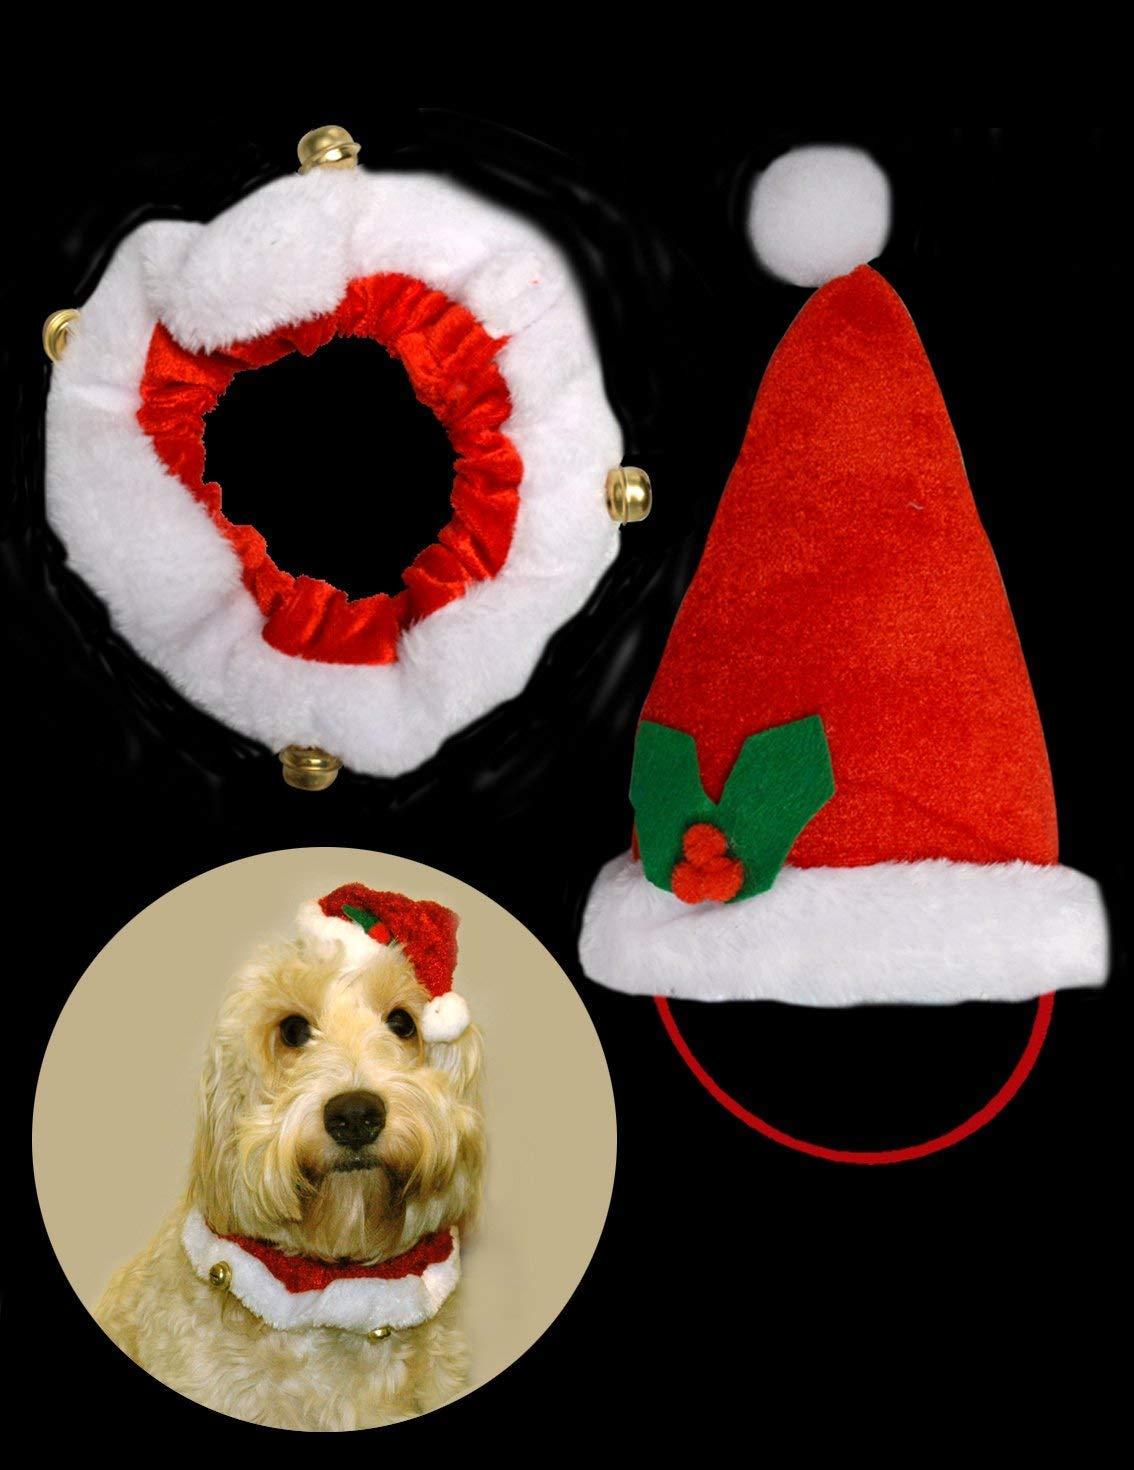 Yappy Christmas Dog Bandana Deluxe Puppy Pet Festive Collar Adjustable Happy Xma